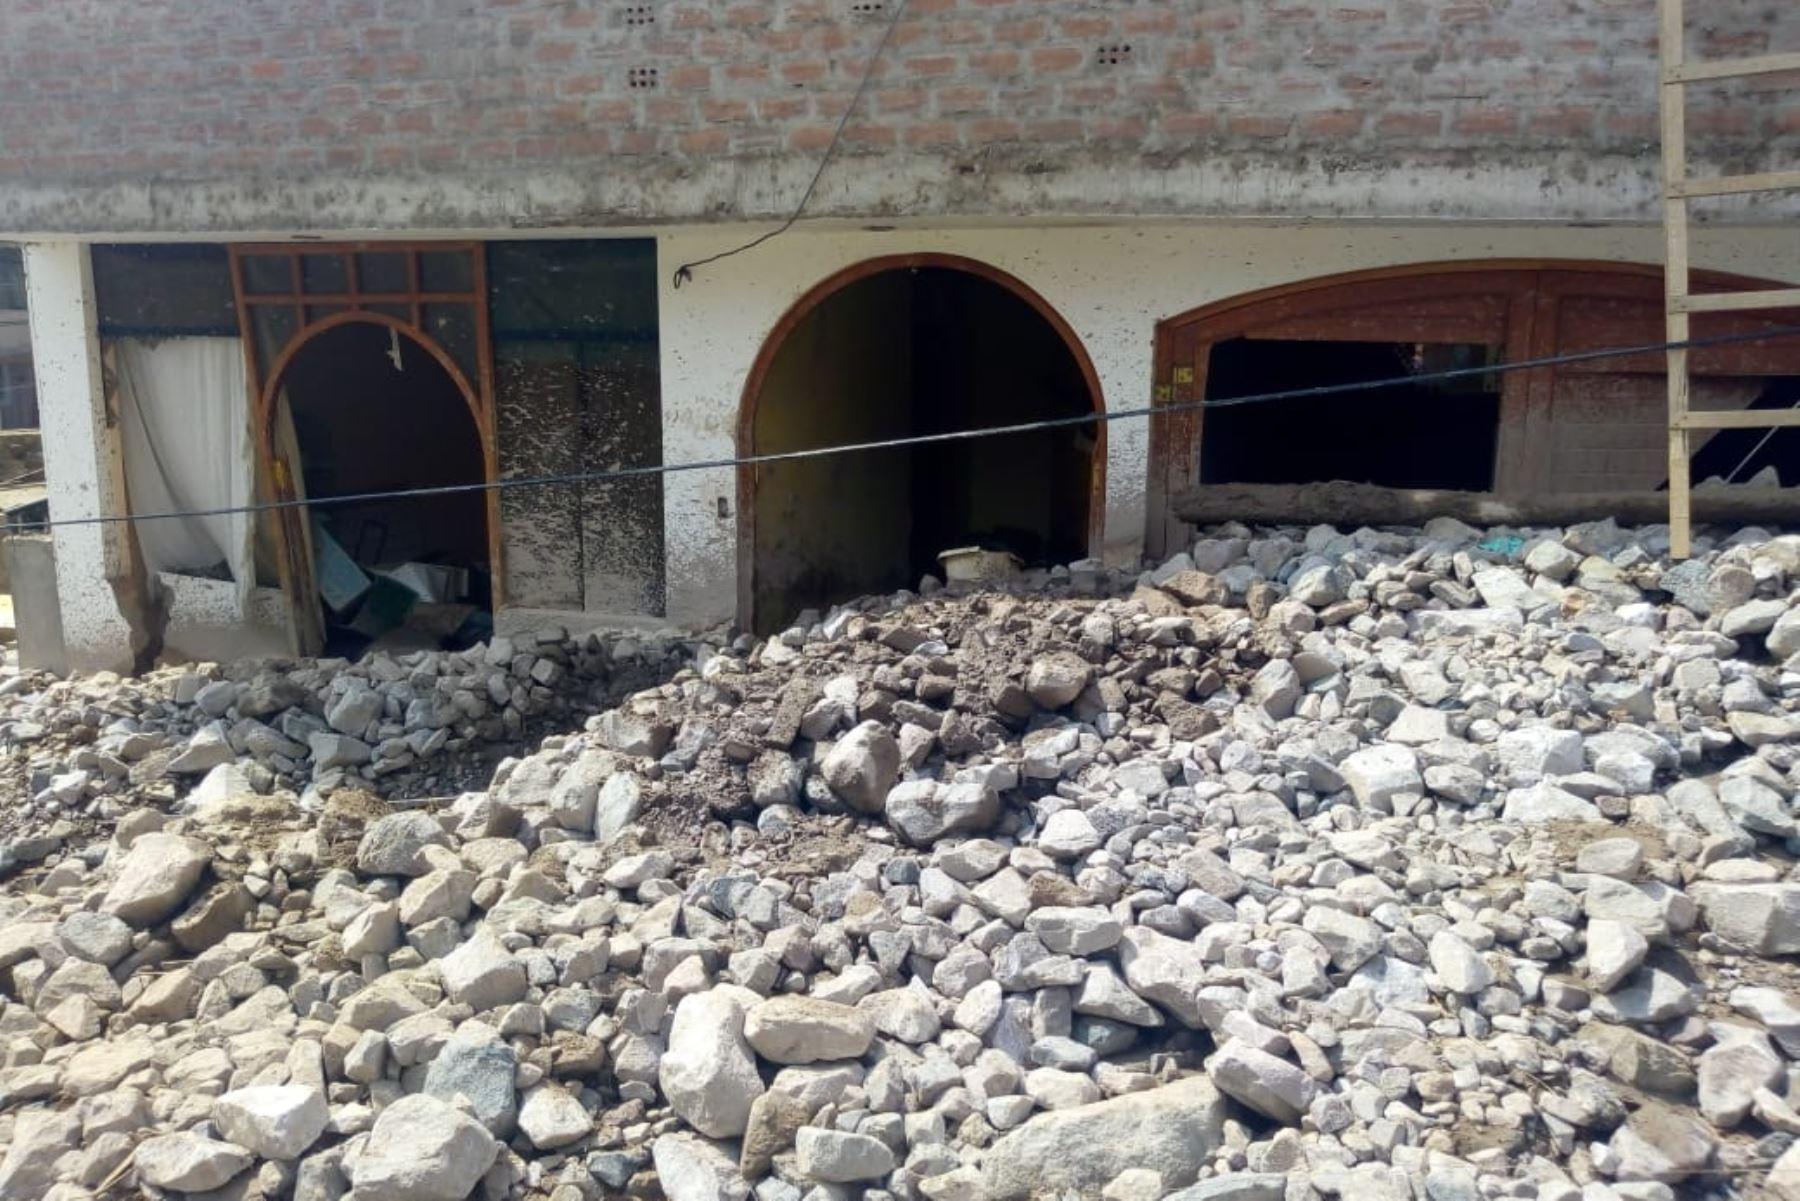 3 Muertos por huaico en Arequipa, distrito de Aplao. Foto: ANDINA/Difusión